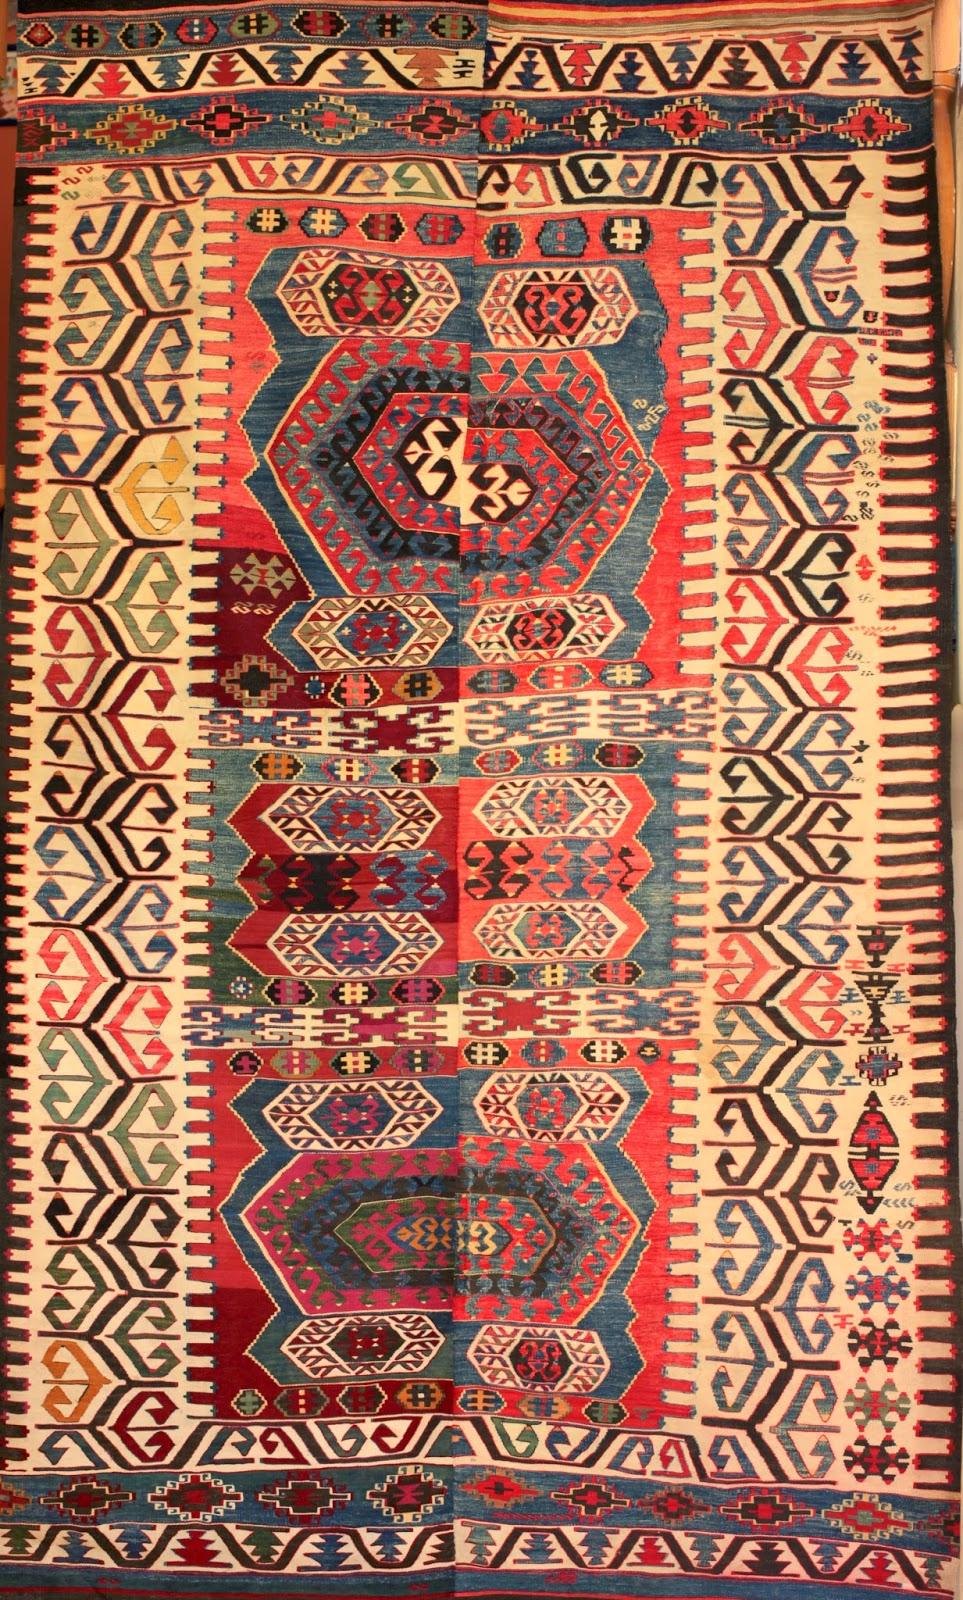 Anatolian Kilim Rugs Antiques And Tribal Textiles